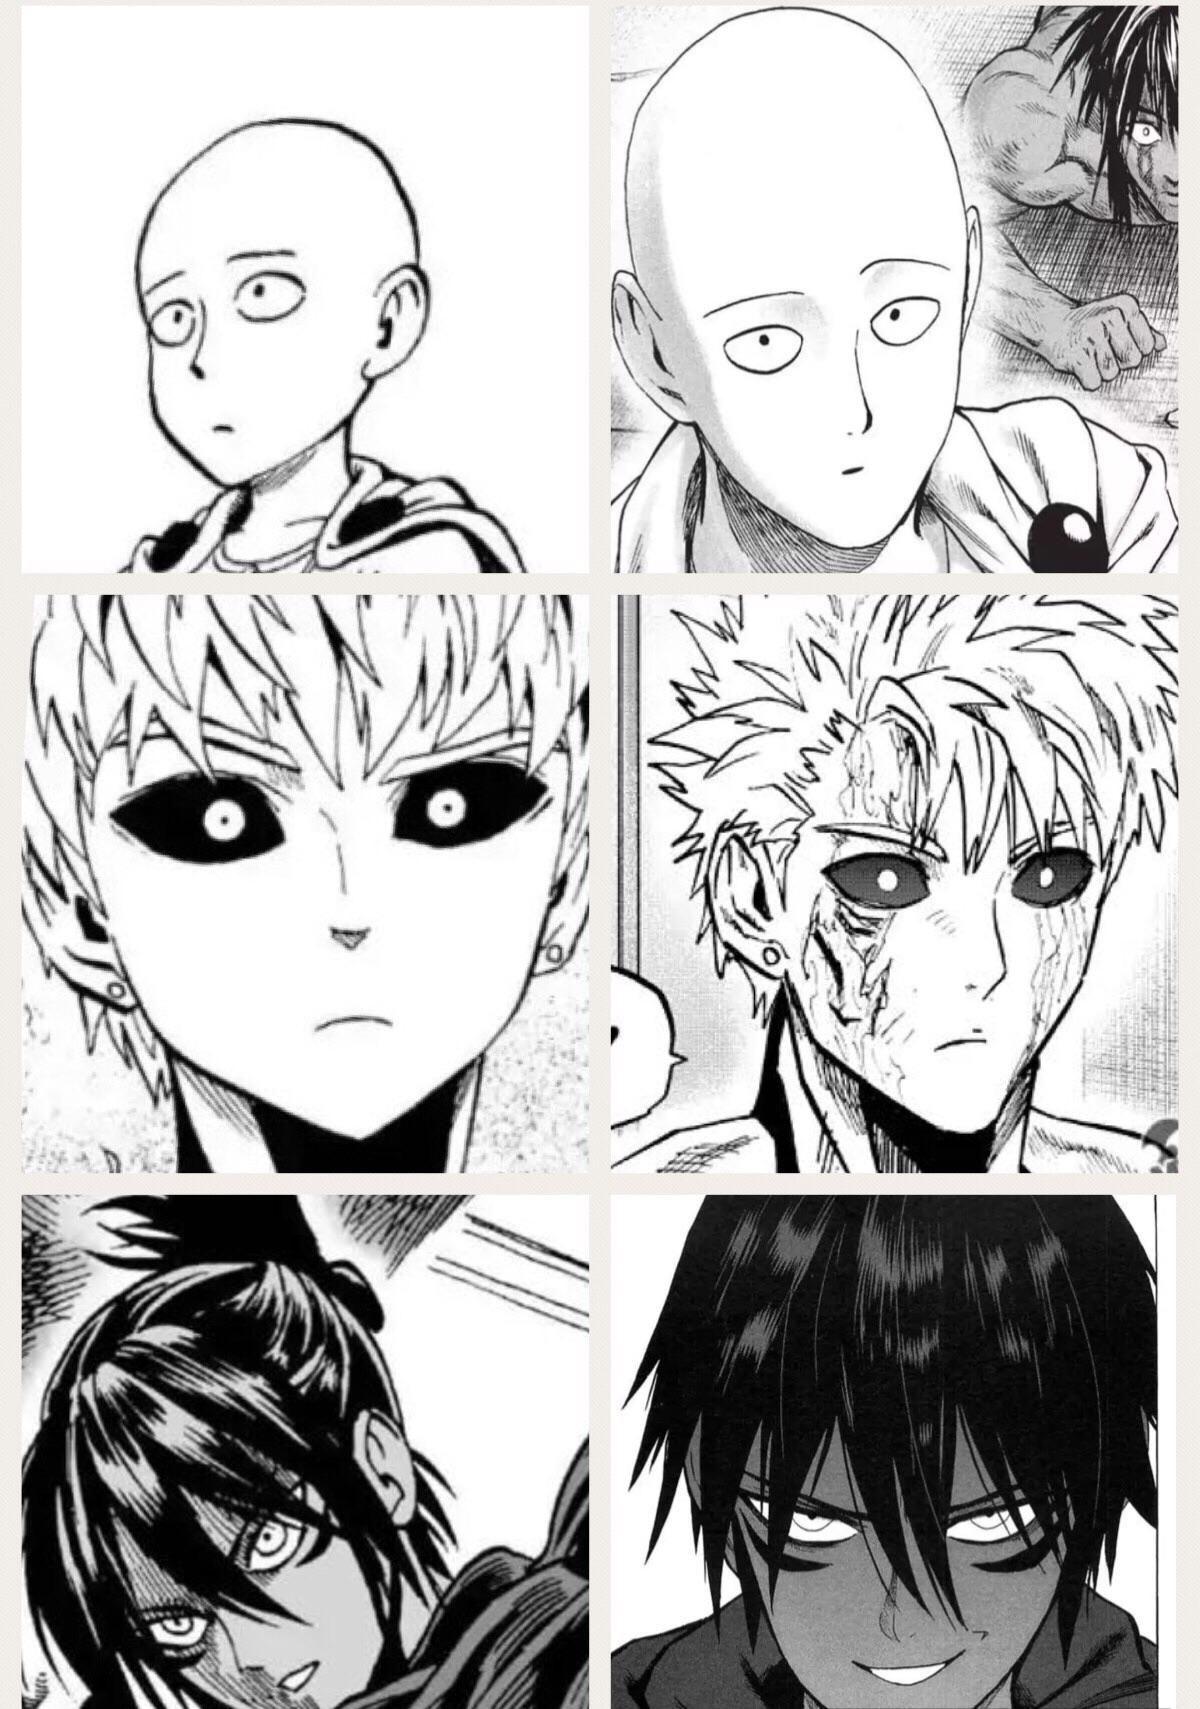 Evolution Of Muratas Art Style Manga One Punch Man Saitama Anime